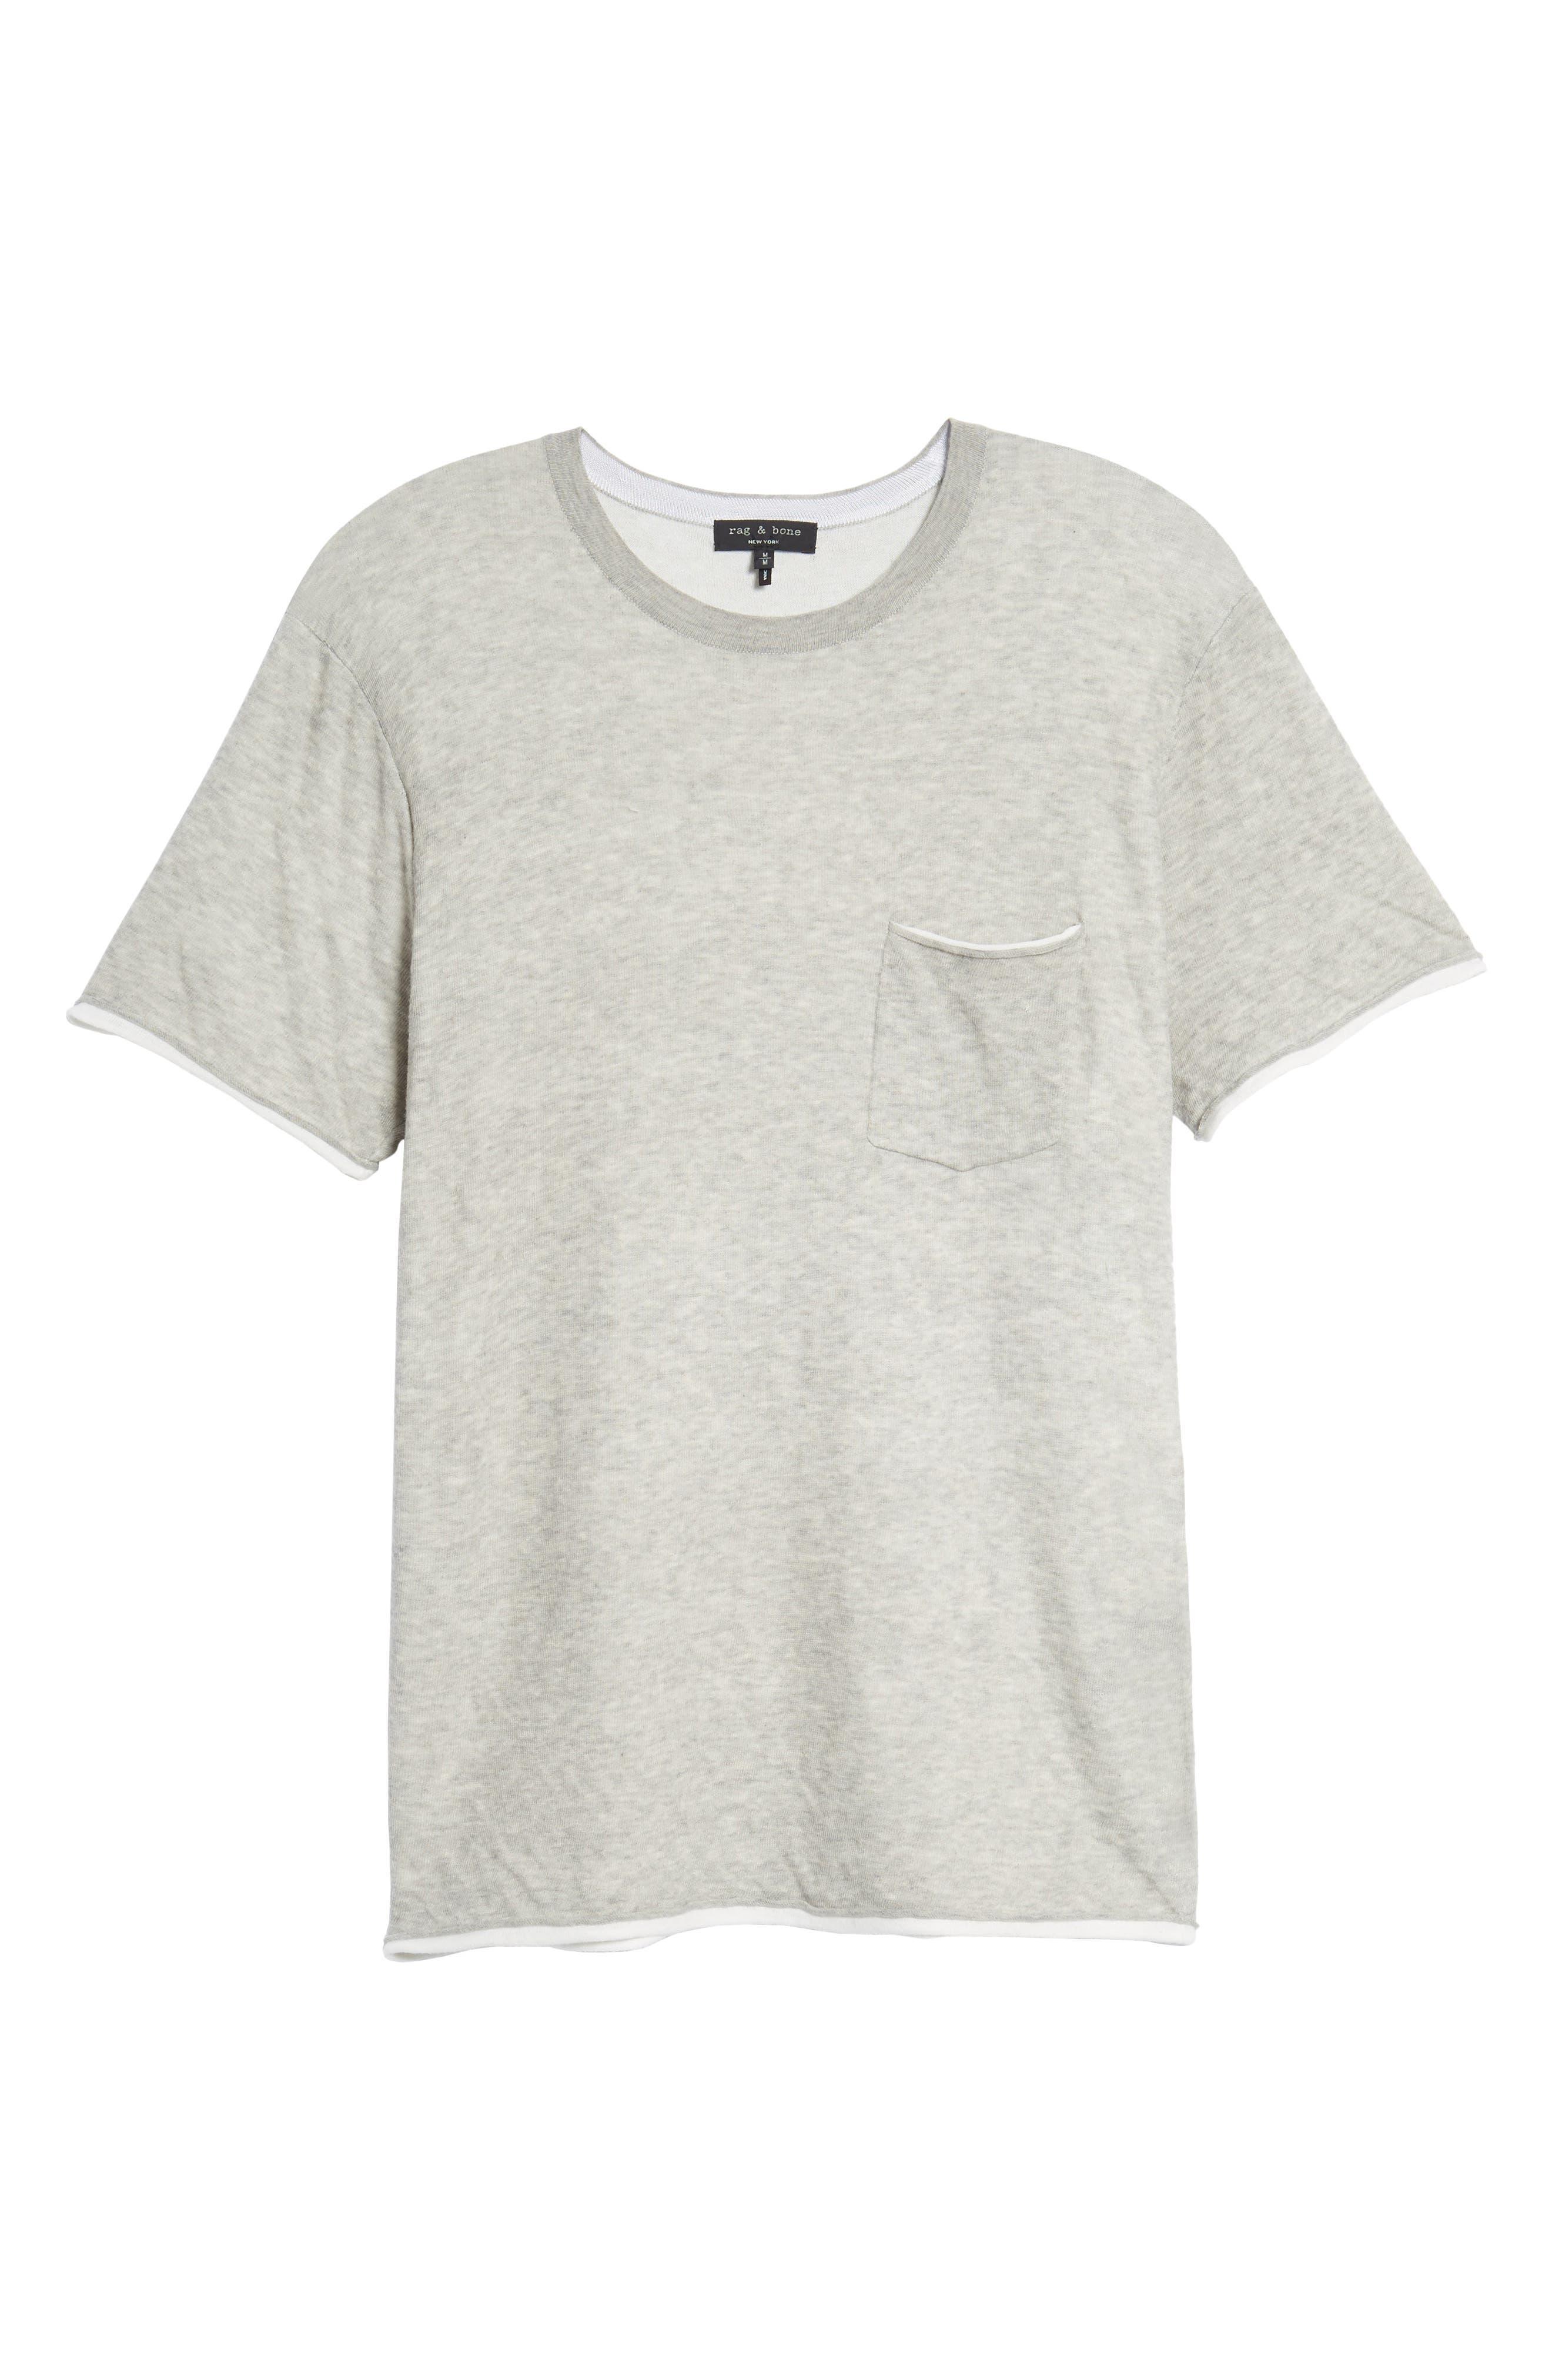 Tripp Cotton & Wool T-Shirt,                             Alternate thumbnail 6, color,                             068